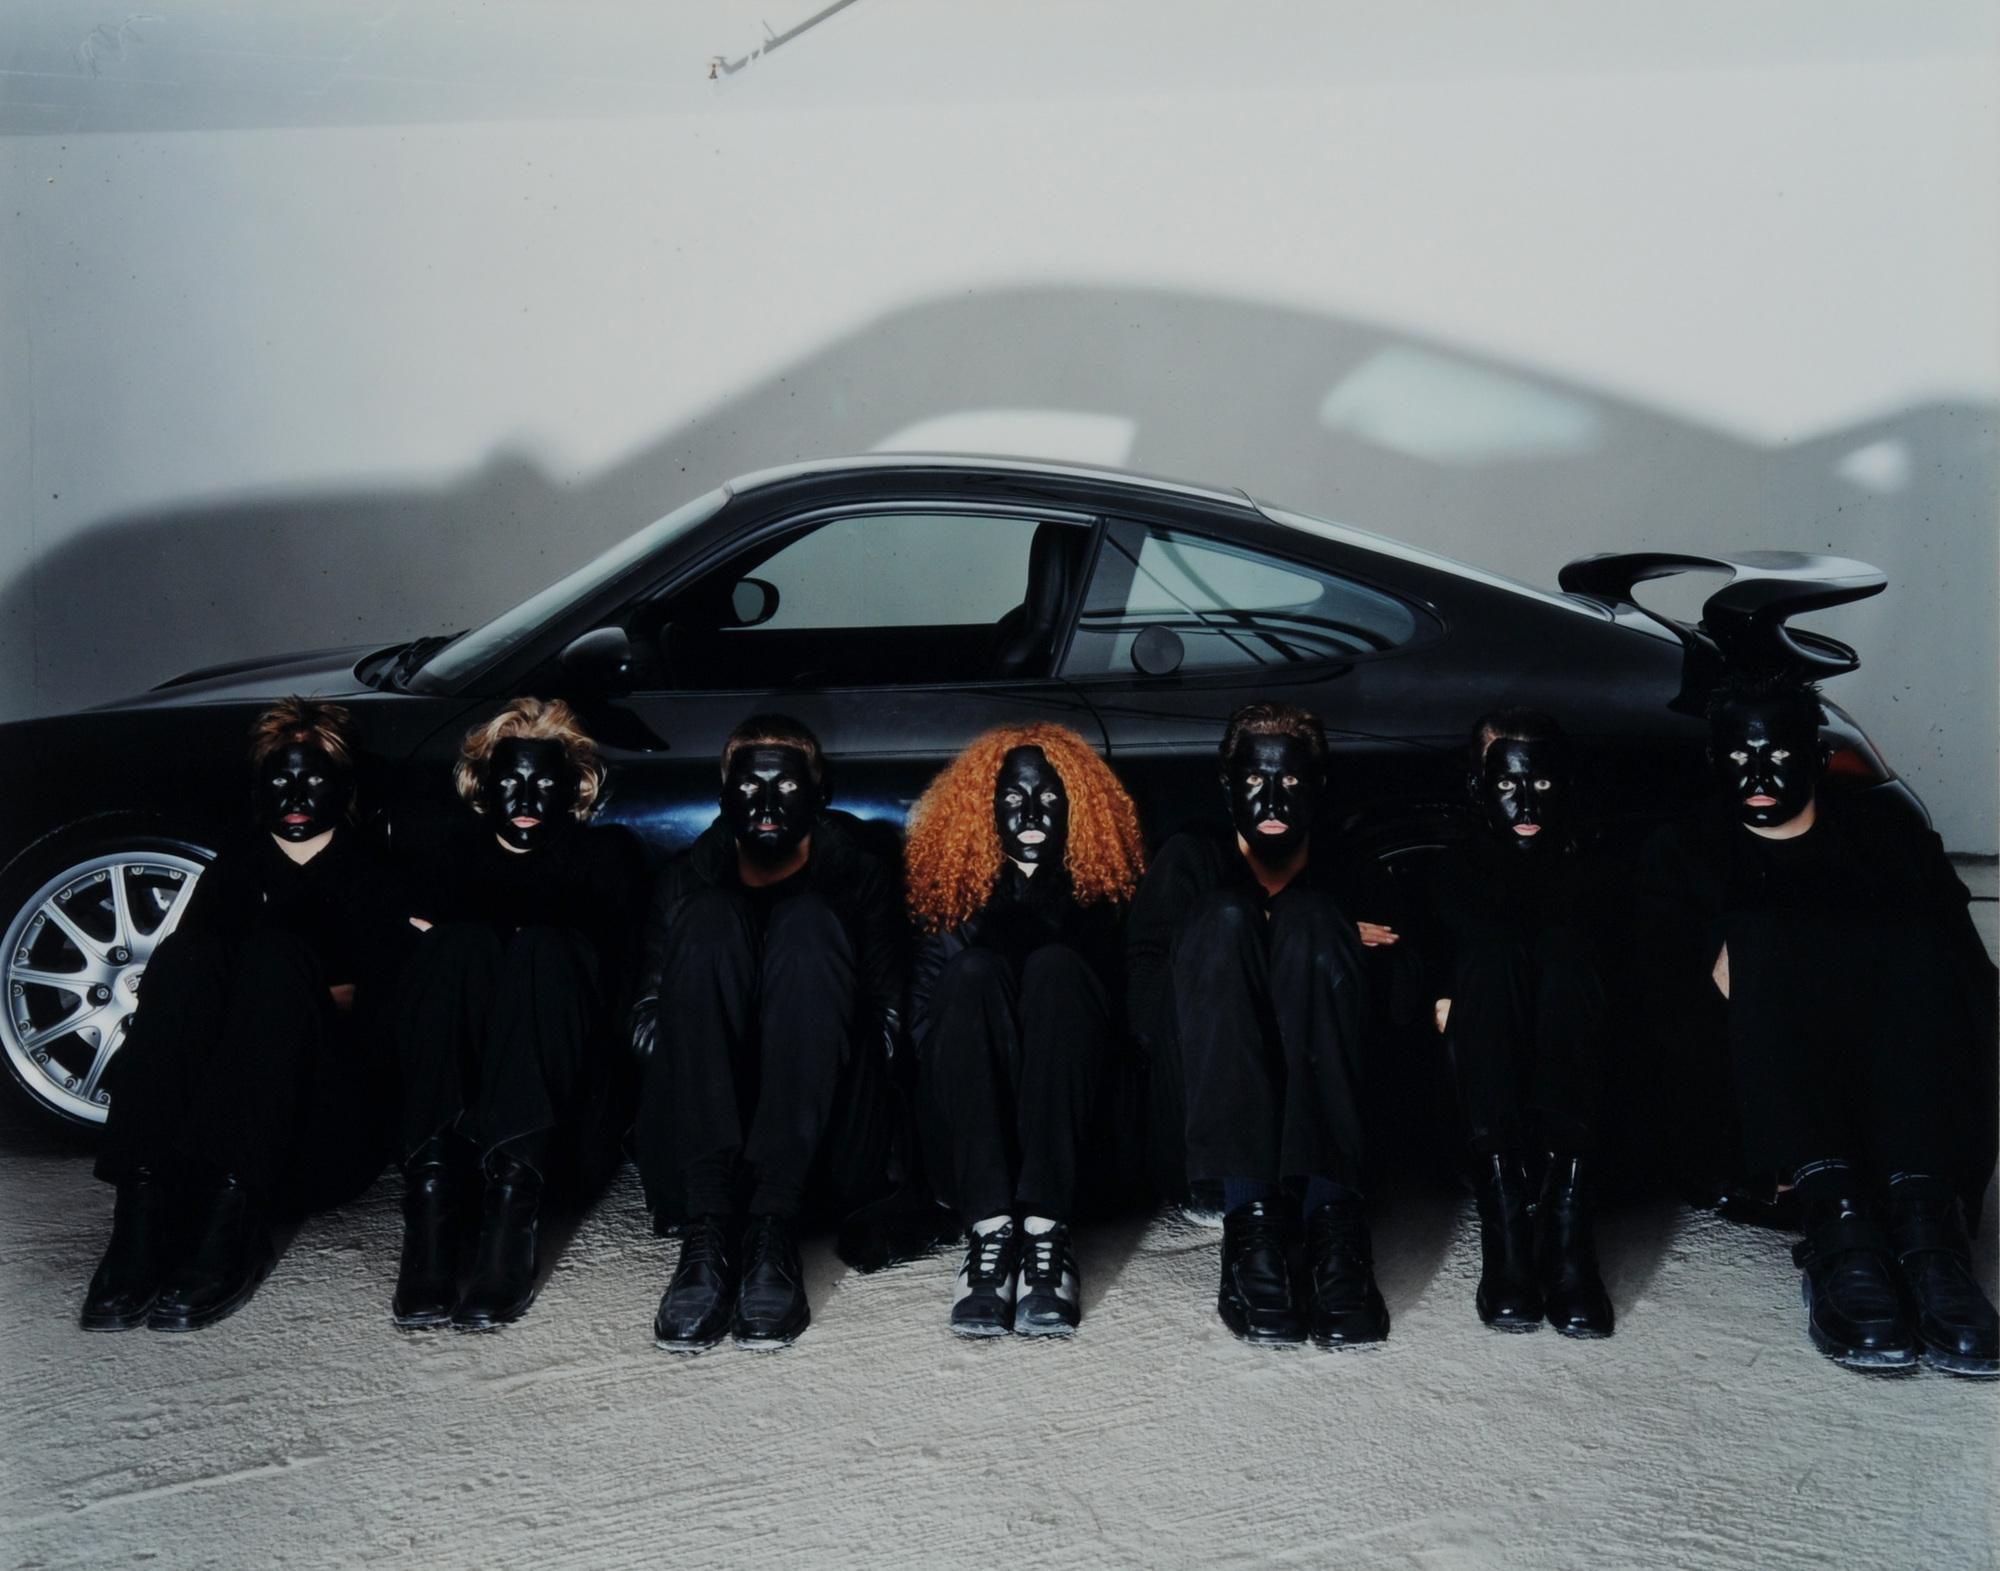 Breuning Olaf, 4 photographs: Apes, 2001; Primitives, 2001; Smiley, 2000; 911, 2000.